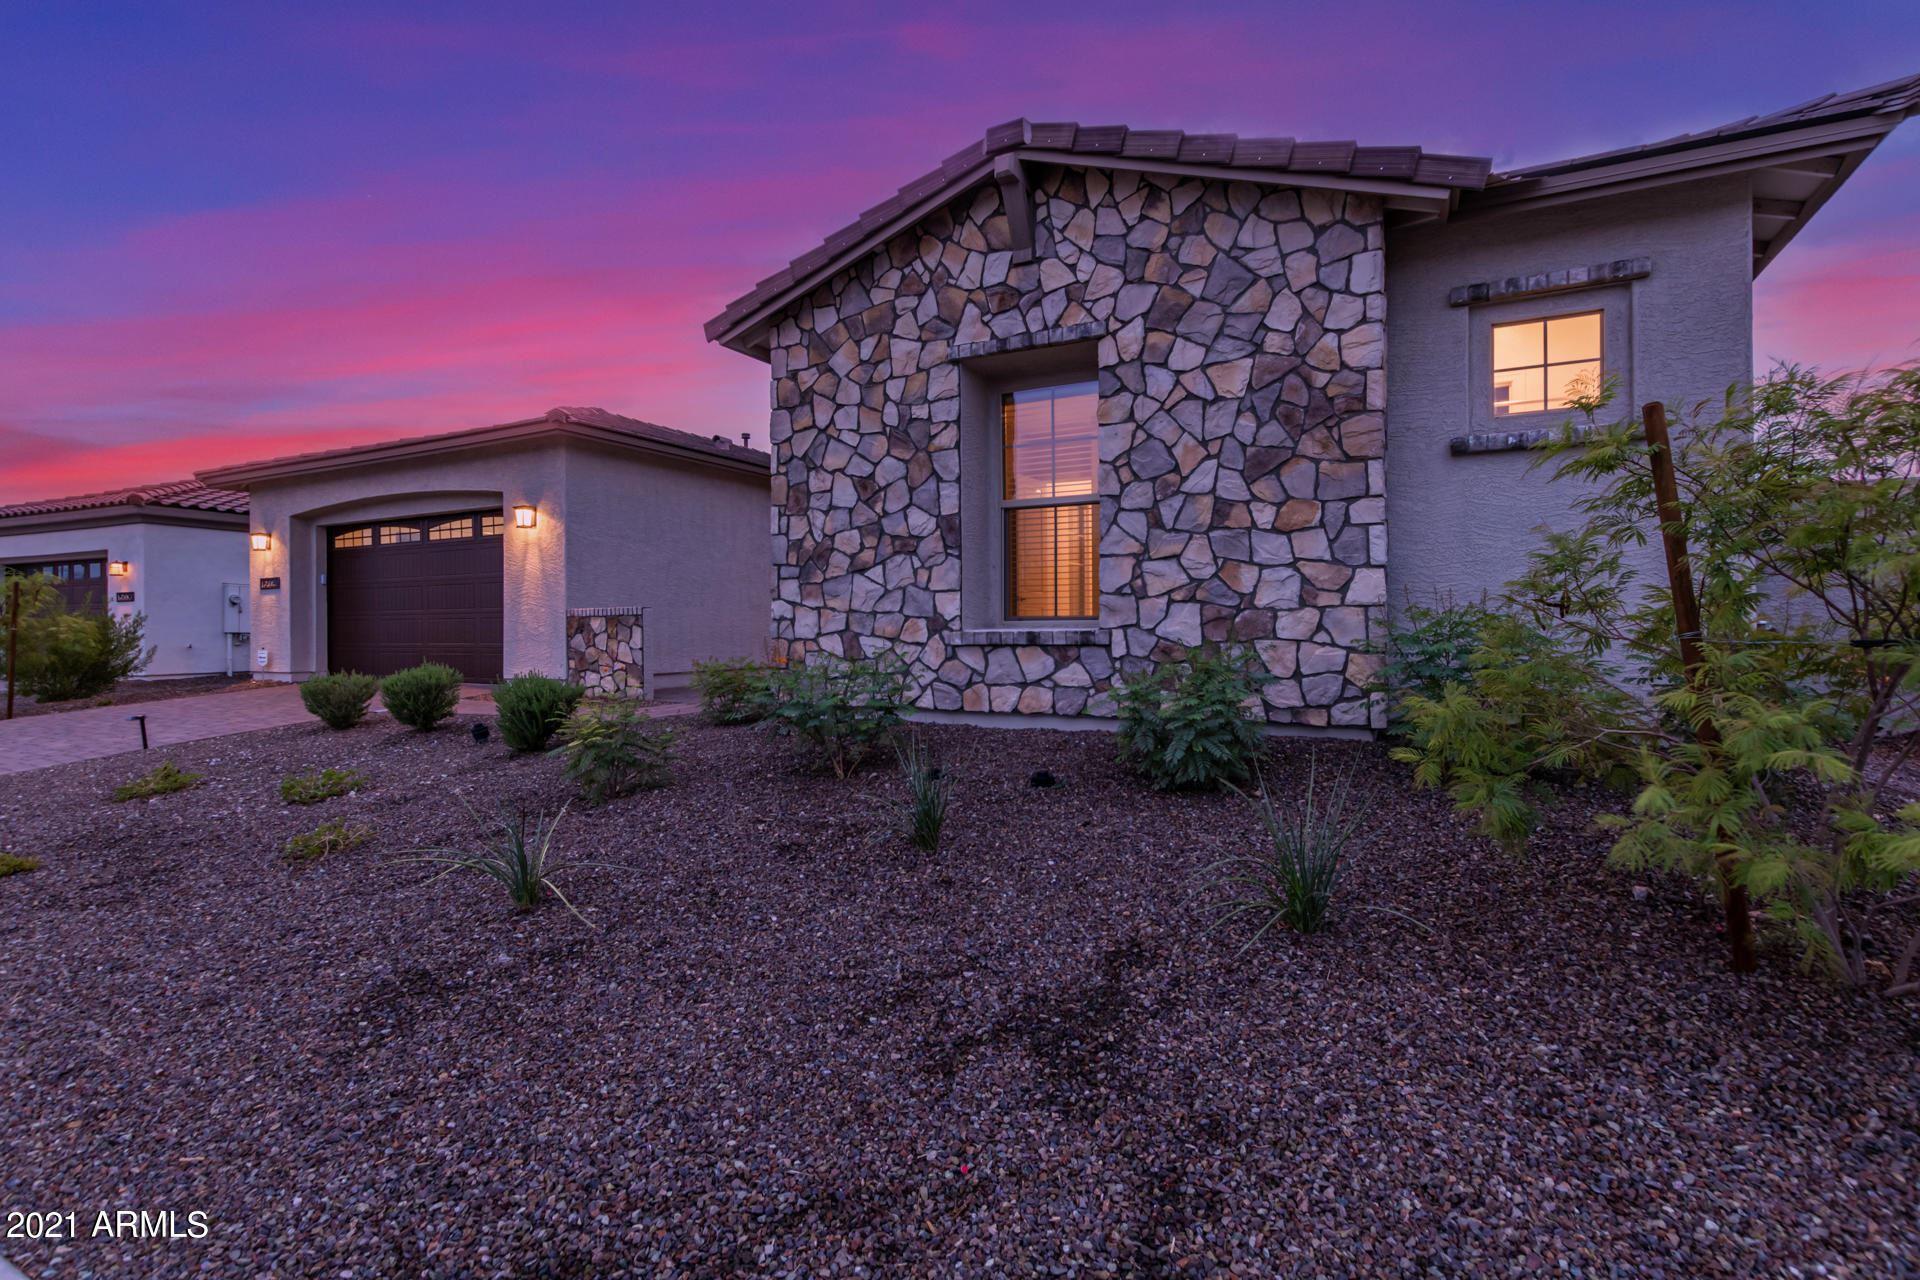 Photo of 15028 S 184TH Avenue, Goodyear, AZ 85338 (MLS # 6269180)